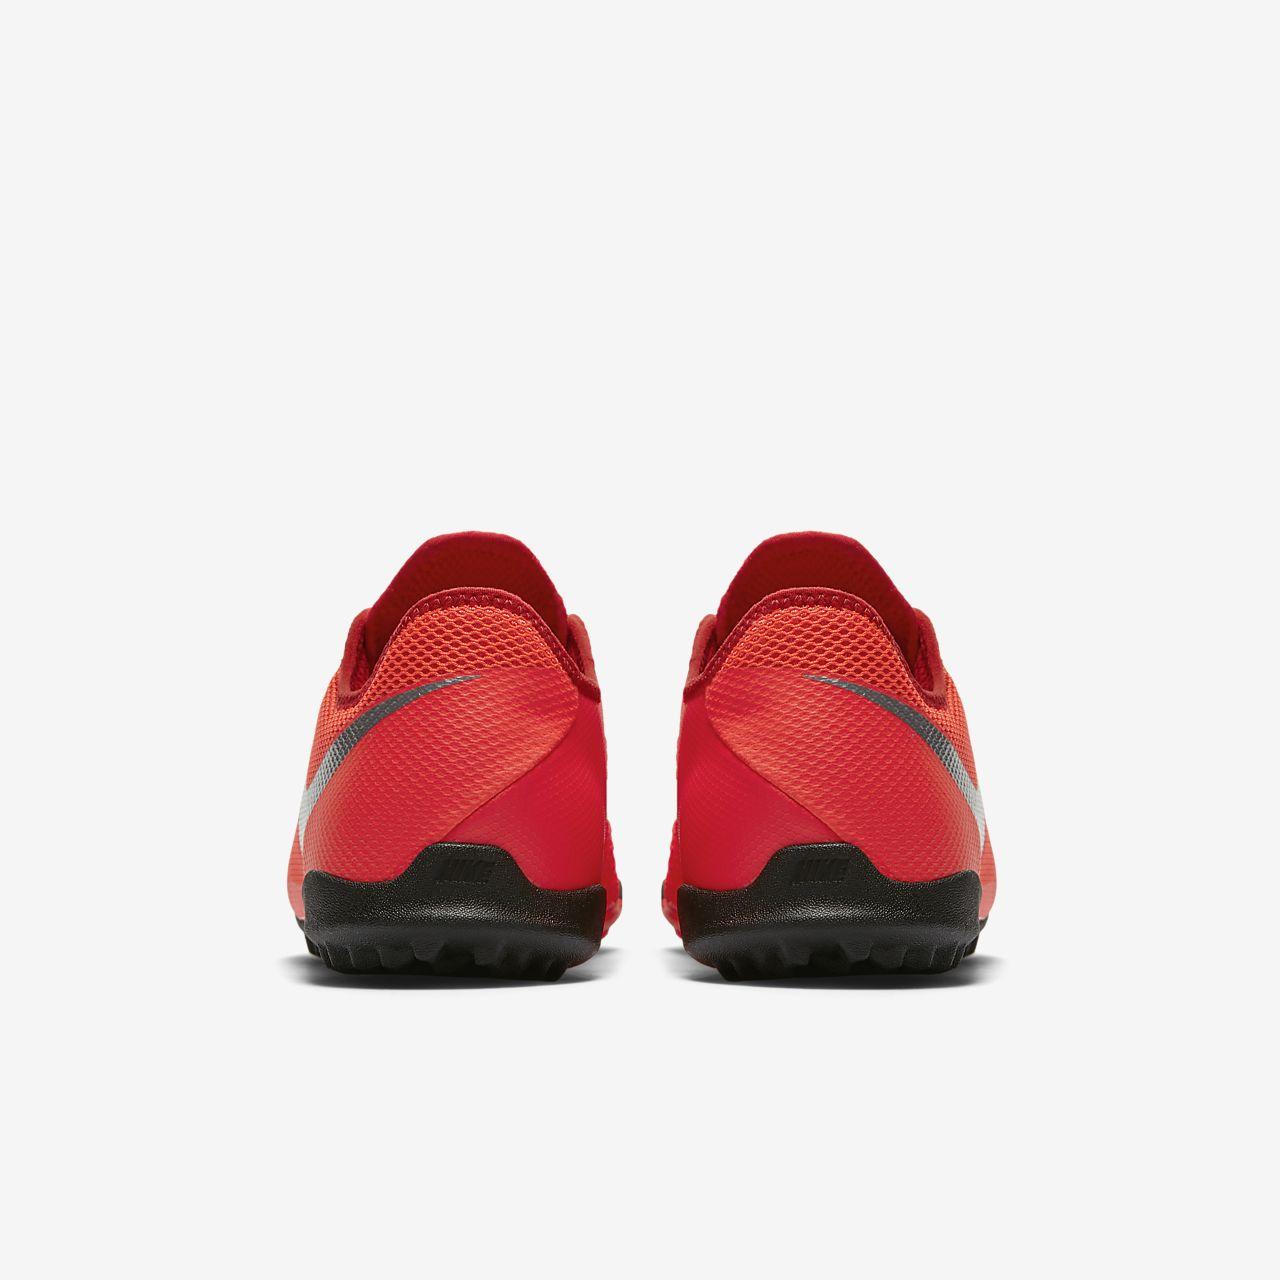 bfa7f11dadb94 ... Calzado de fútbol para terreno artificial Nike Phantom Vision Academy